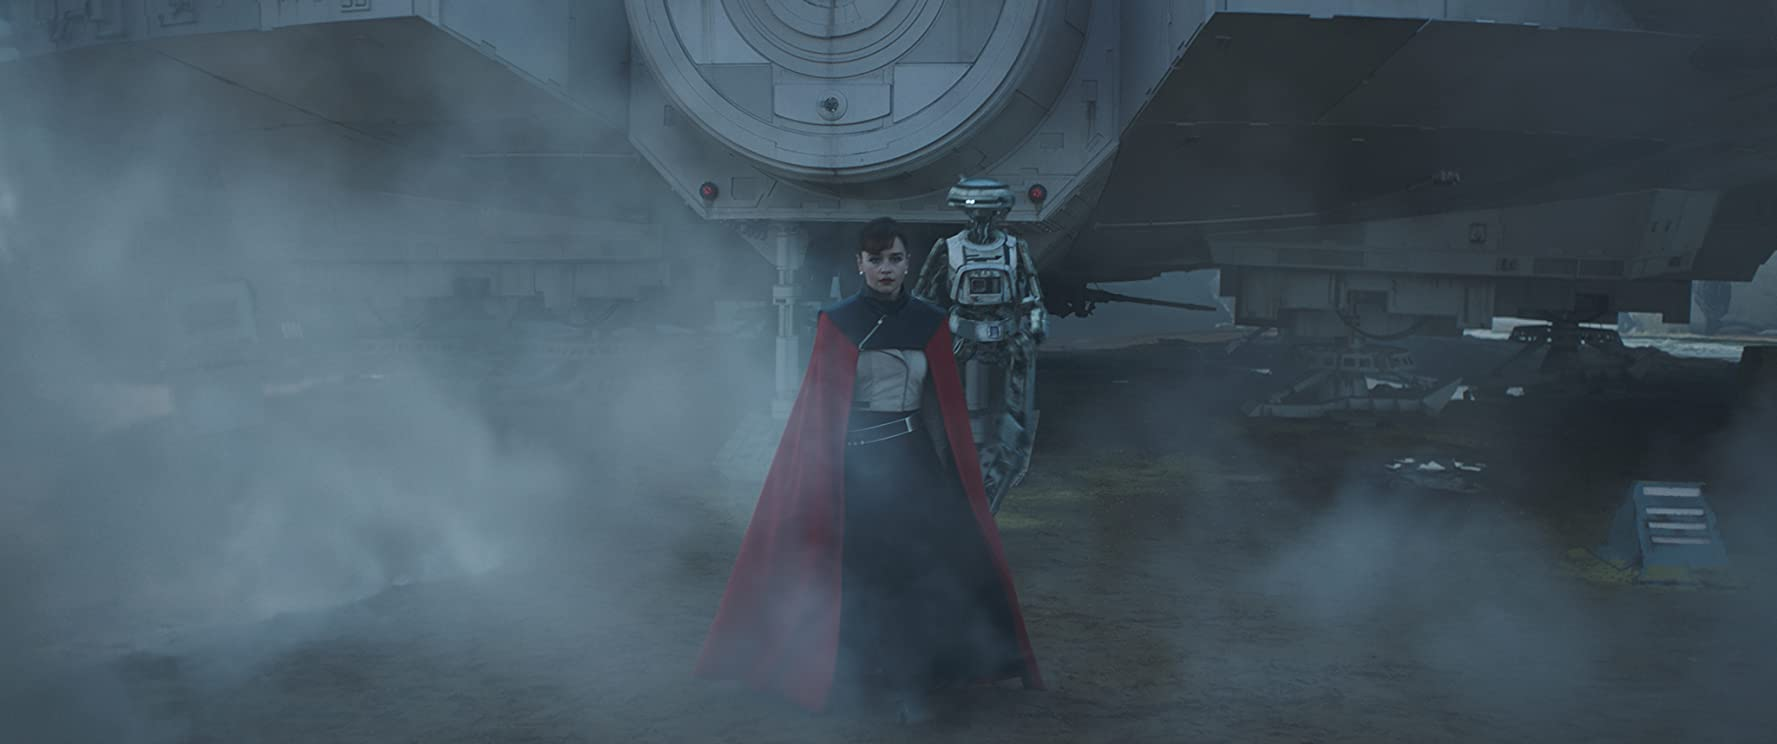 Phoebe Waller-Bridge and Emilia Clarke in Solo: A Star Wars Story (2018)